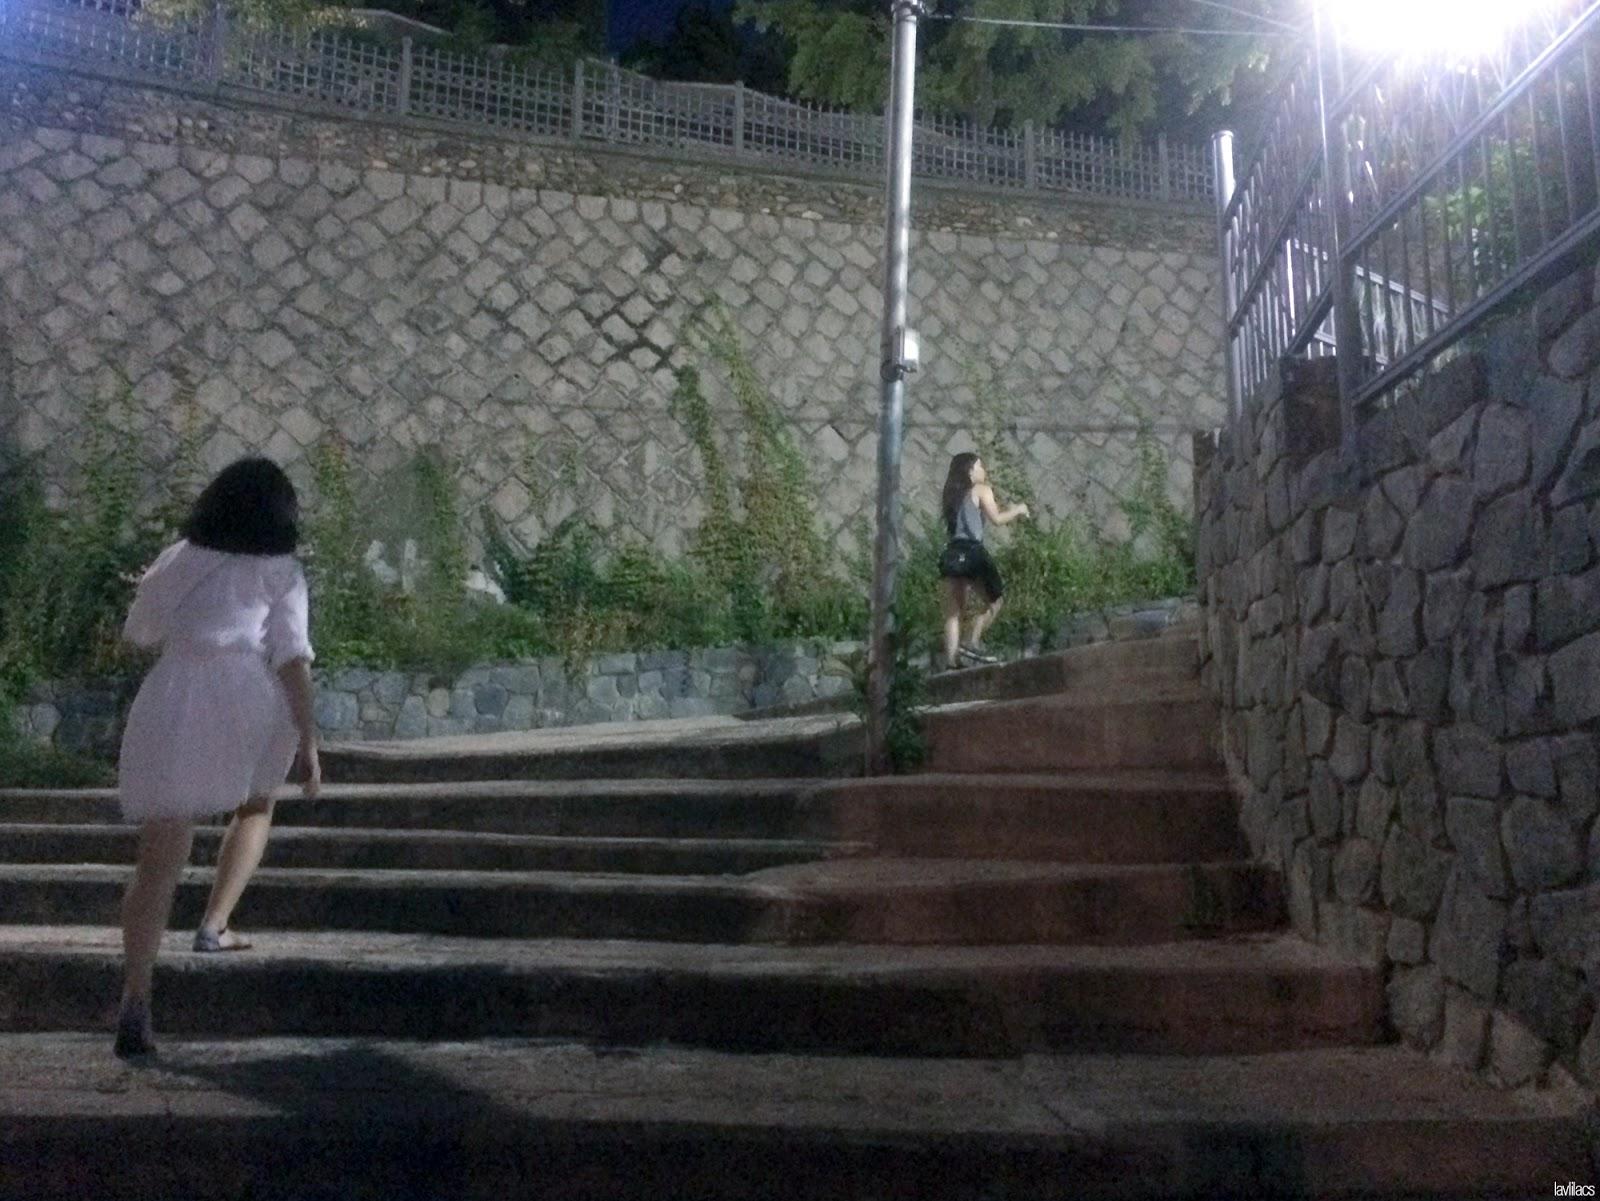 Seoul, Korea - Summer Study Abroad 2014 - Walk towards Namsan Cable Car